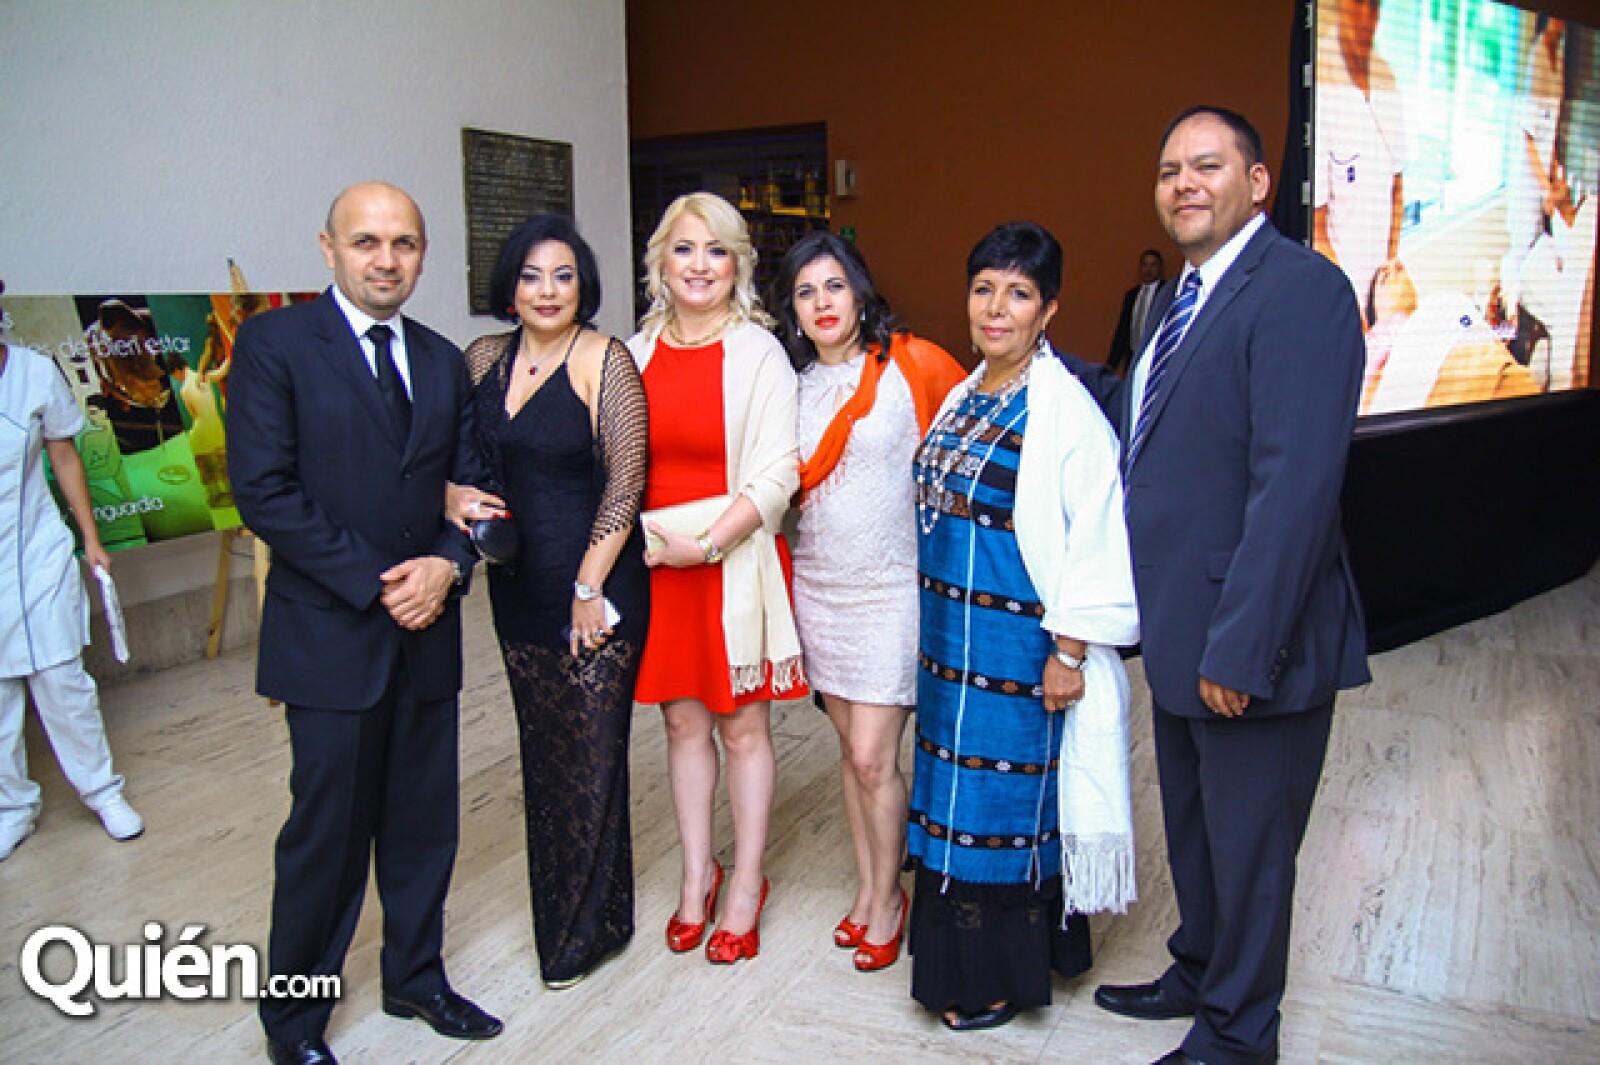 Jorge Arturo Rivero,Patricia Hernández,Saralina Gamboa,Karina Velázquez,Eva Garibay y Pedro Cerón